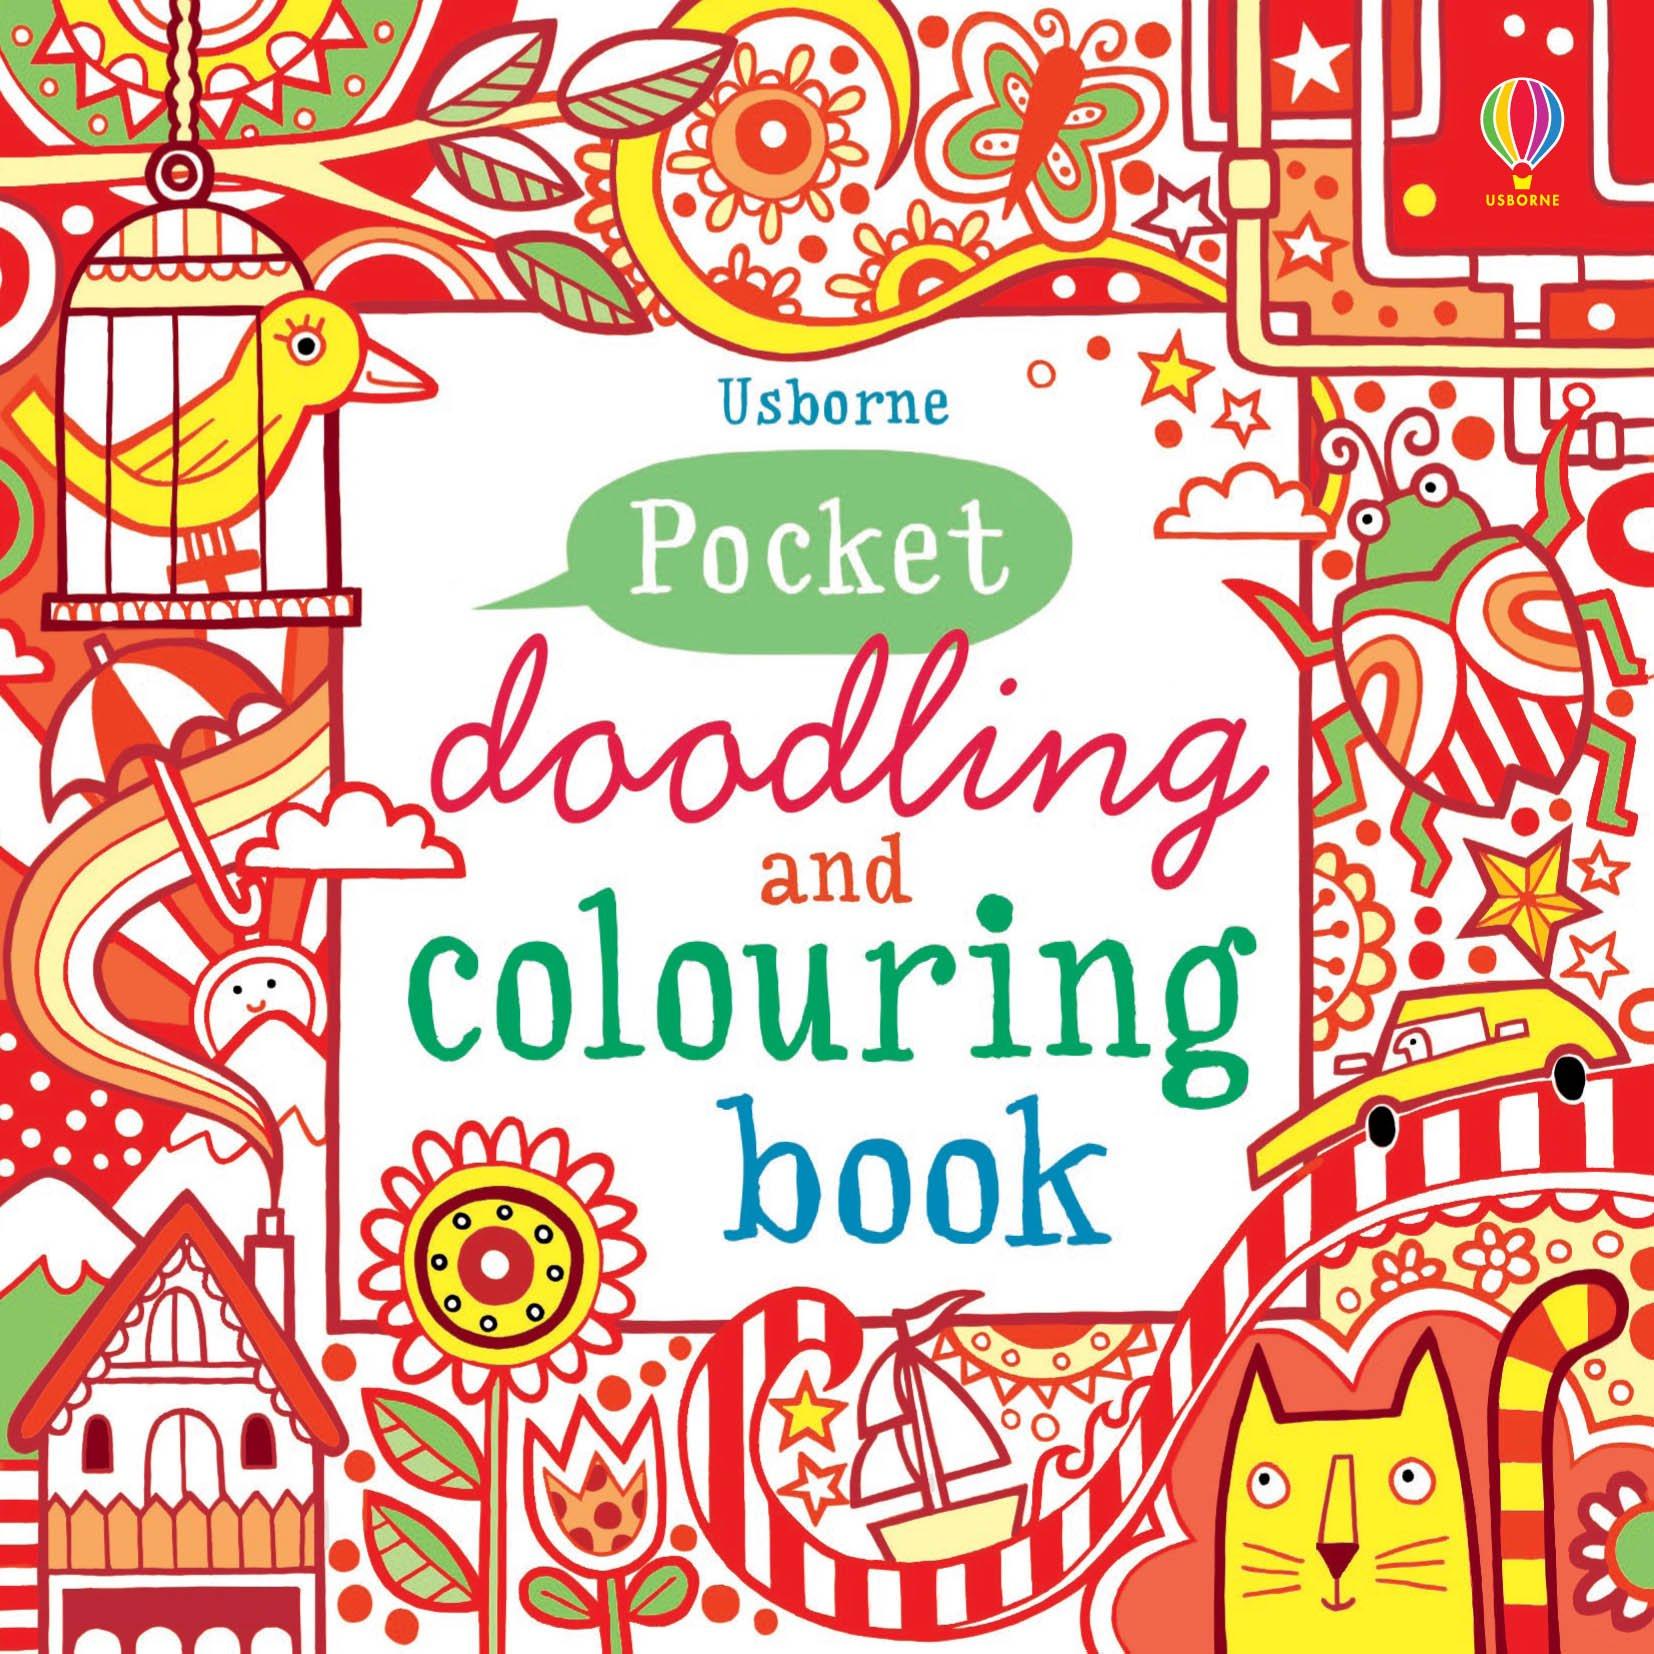 little doodling and colouring book red book usborne art ideas non figg 9781409524137 amazoncom books - Usborne Coloring Books